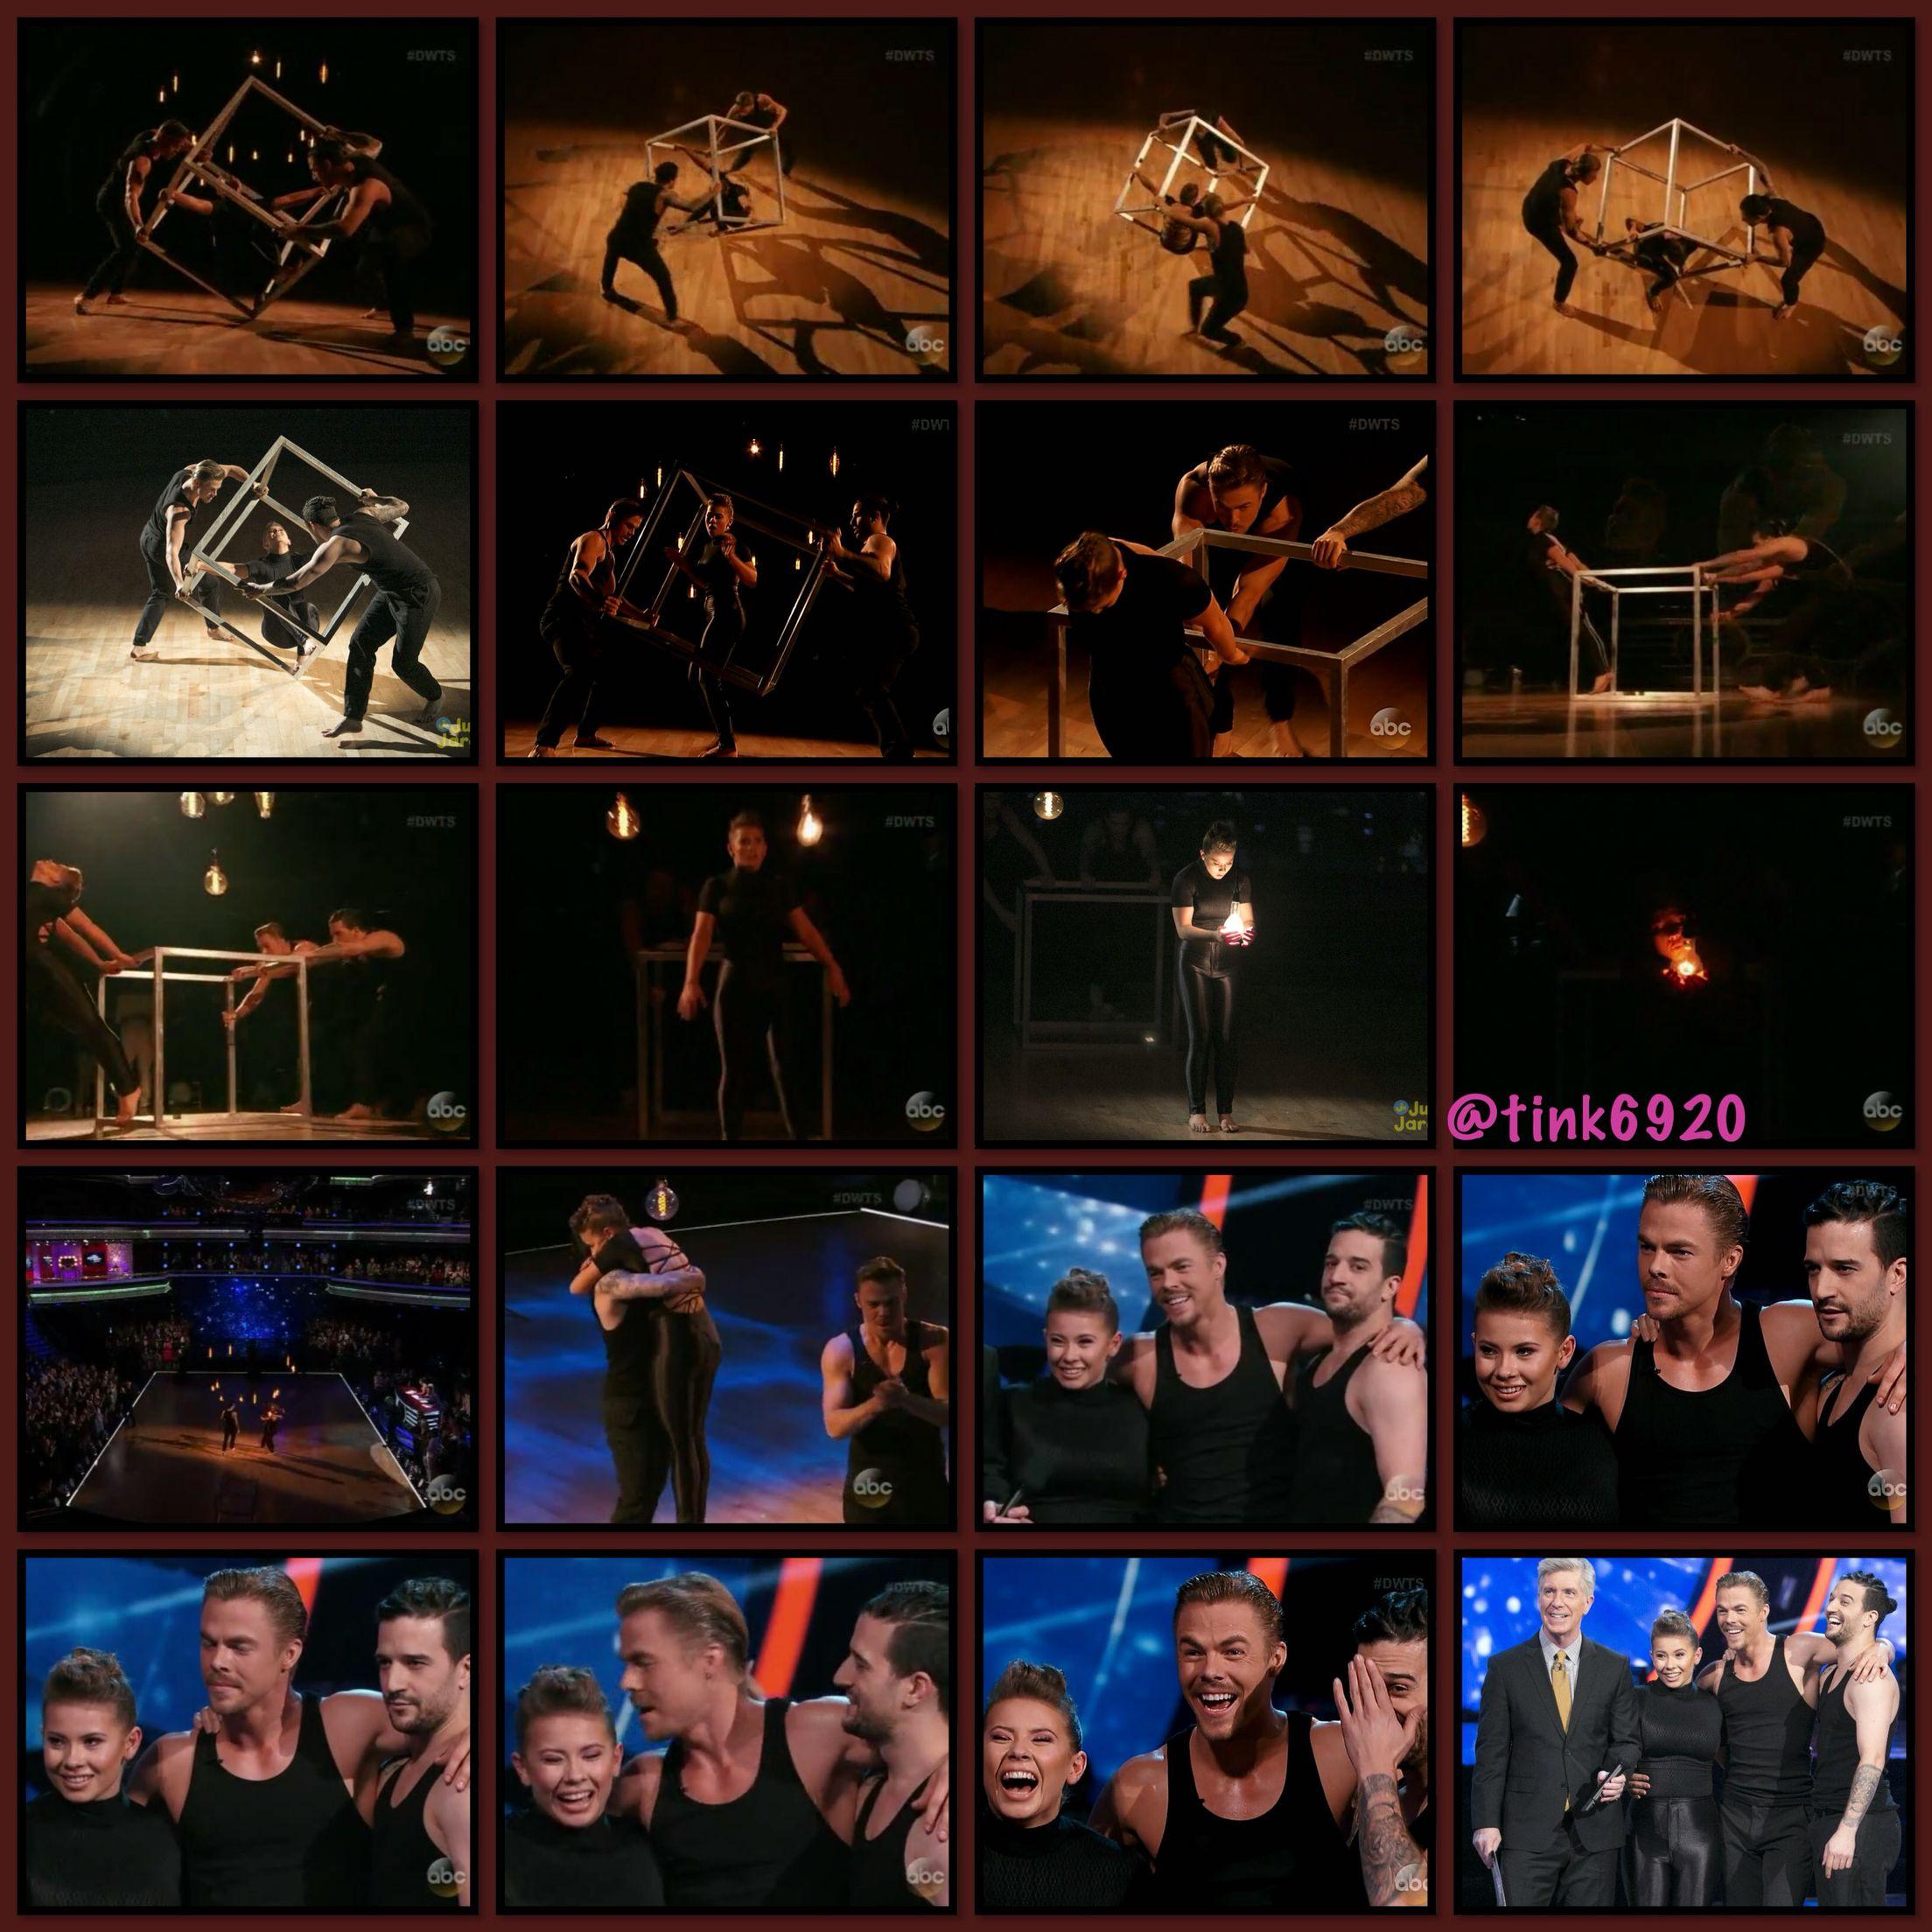 Team Crikey's Jazz trio ❤️ some pics by: purederekhough